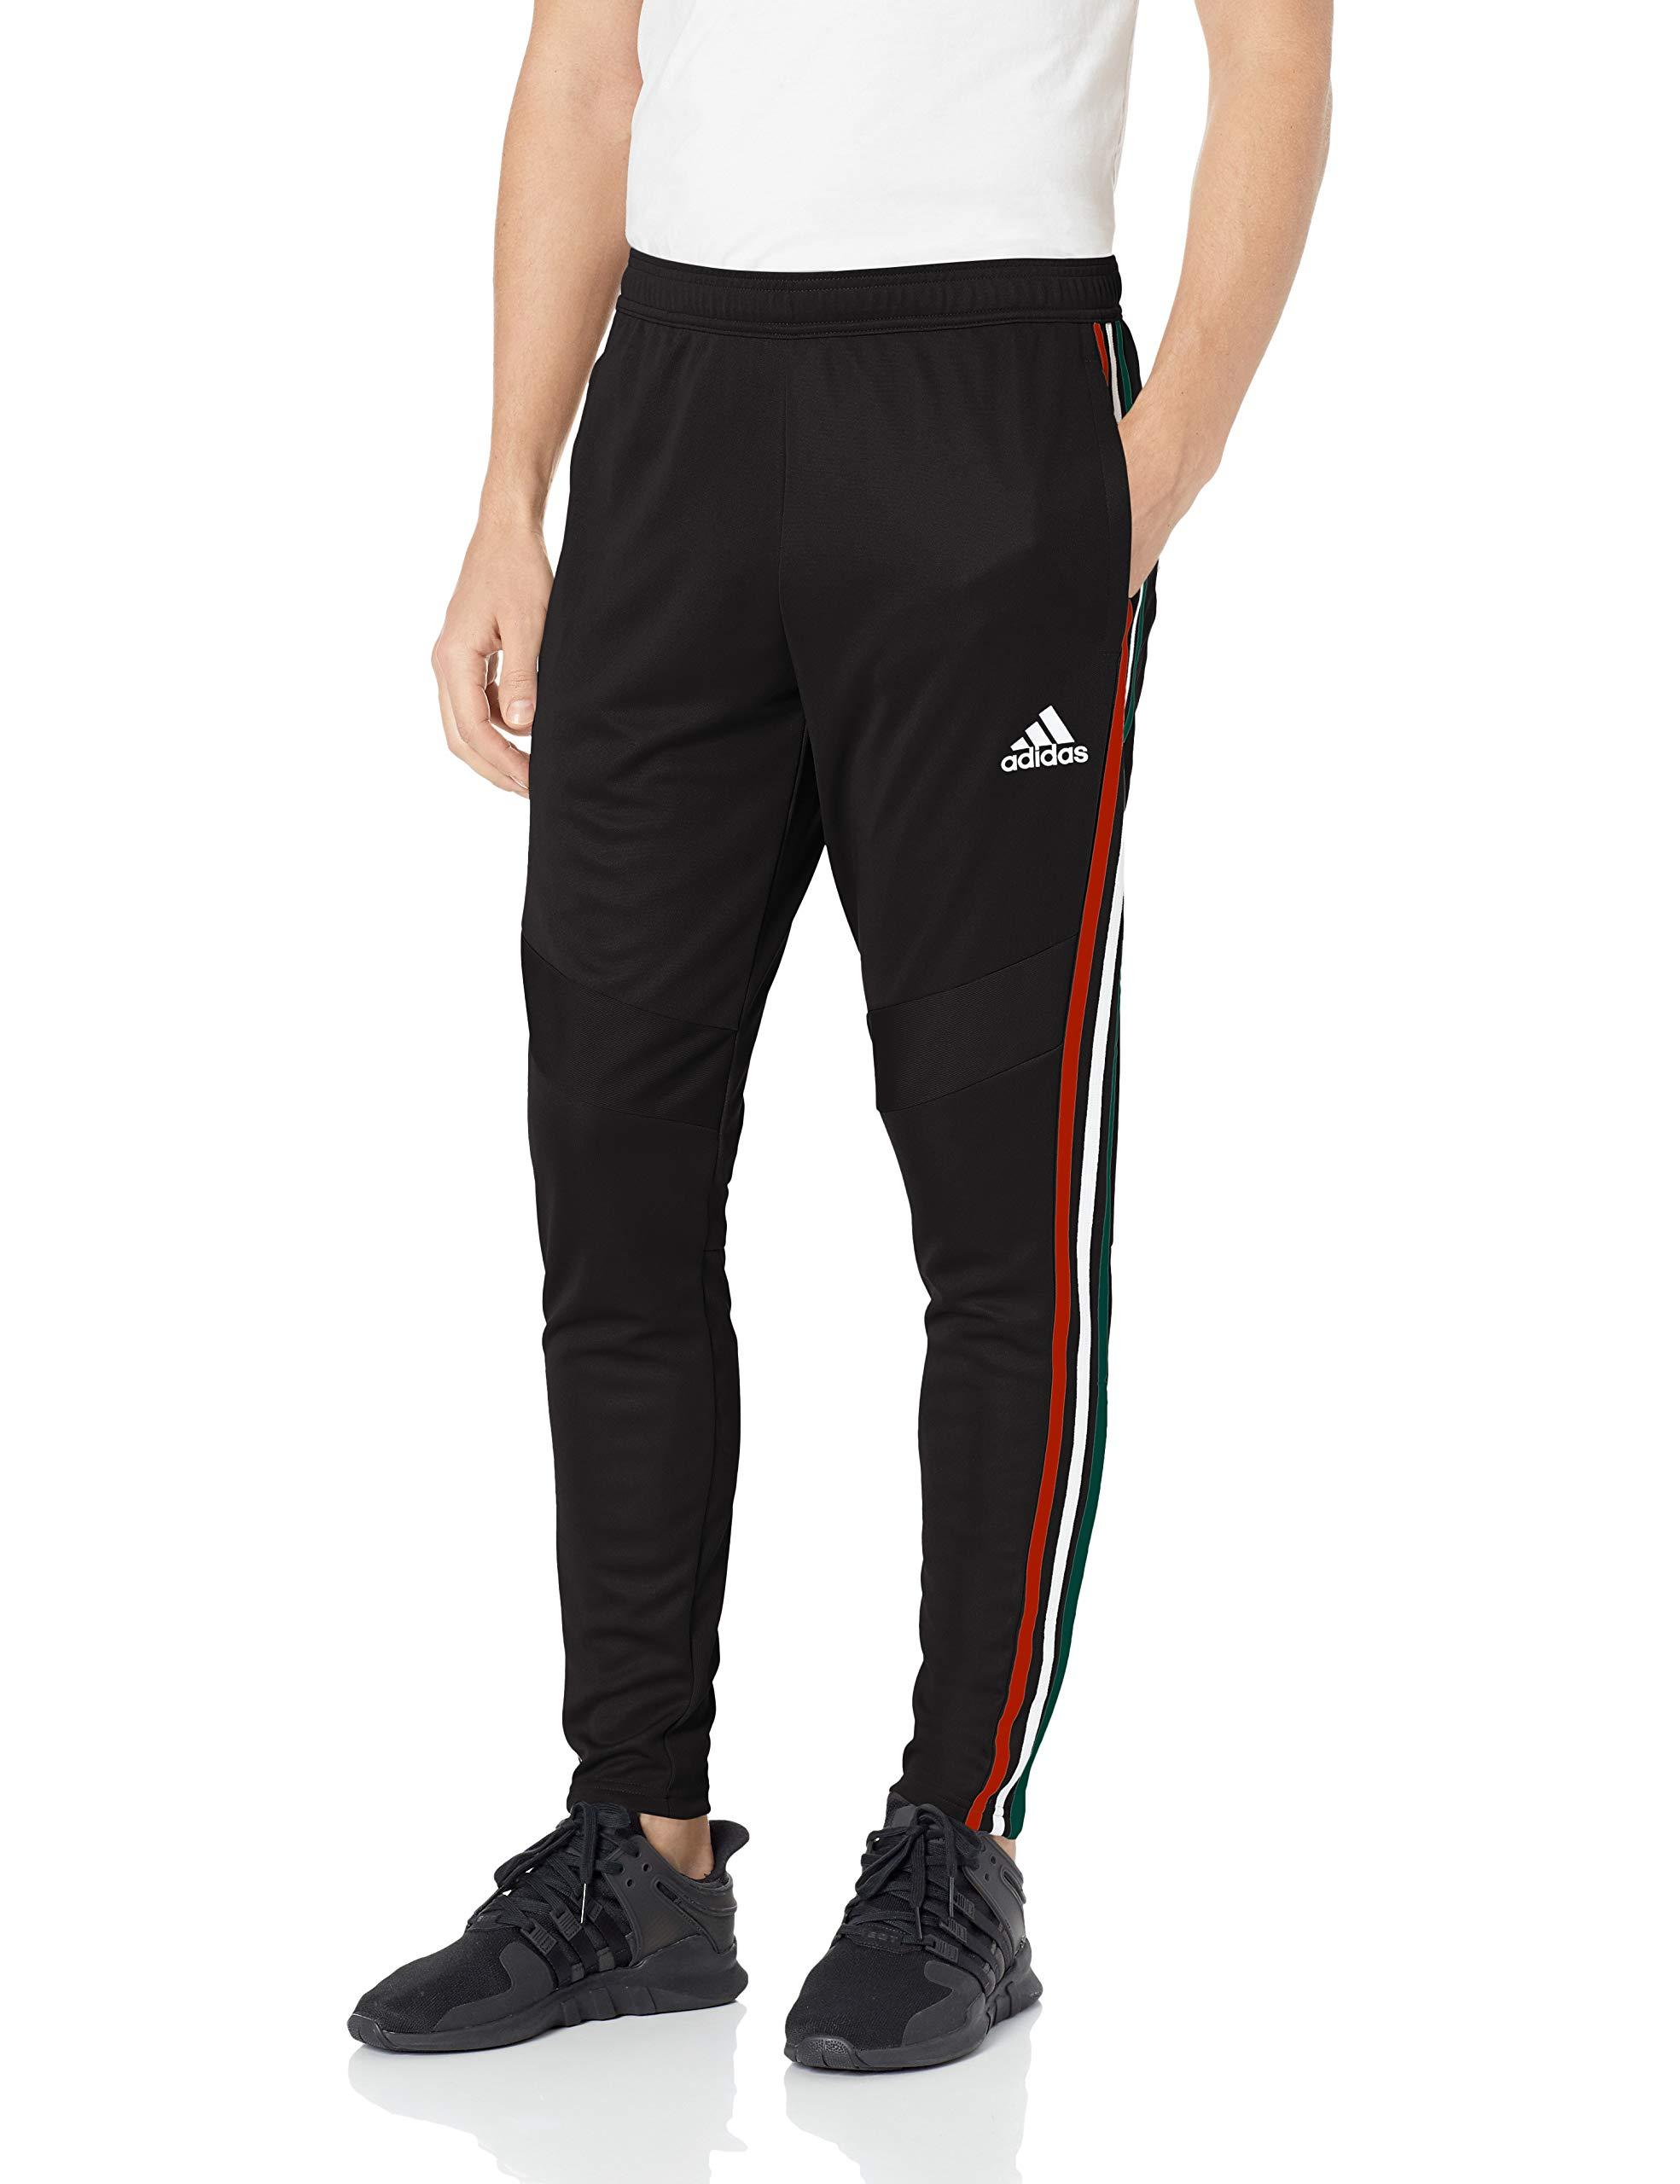 adidas Tiro19 Pant, Black, Large